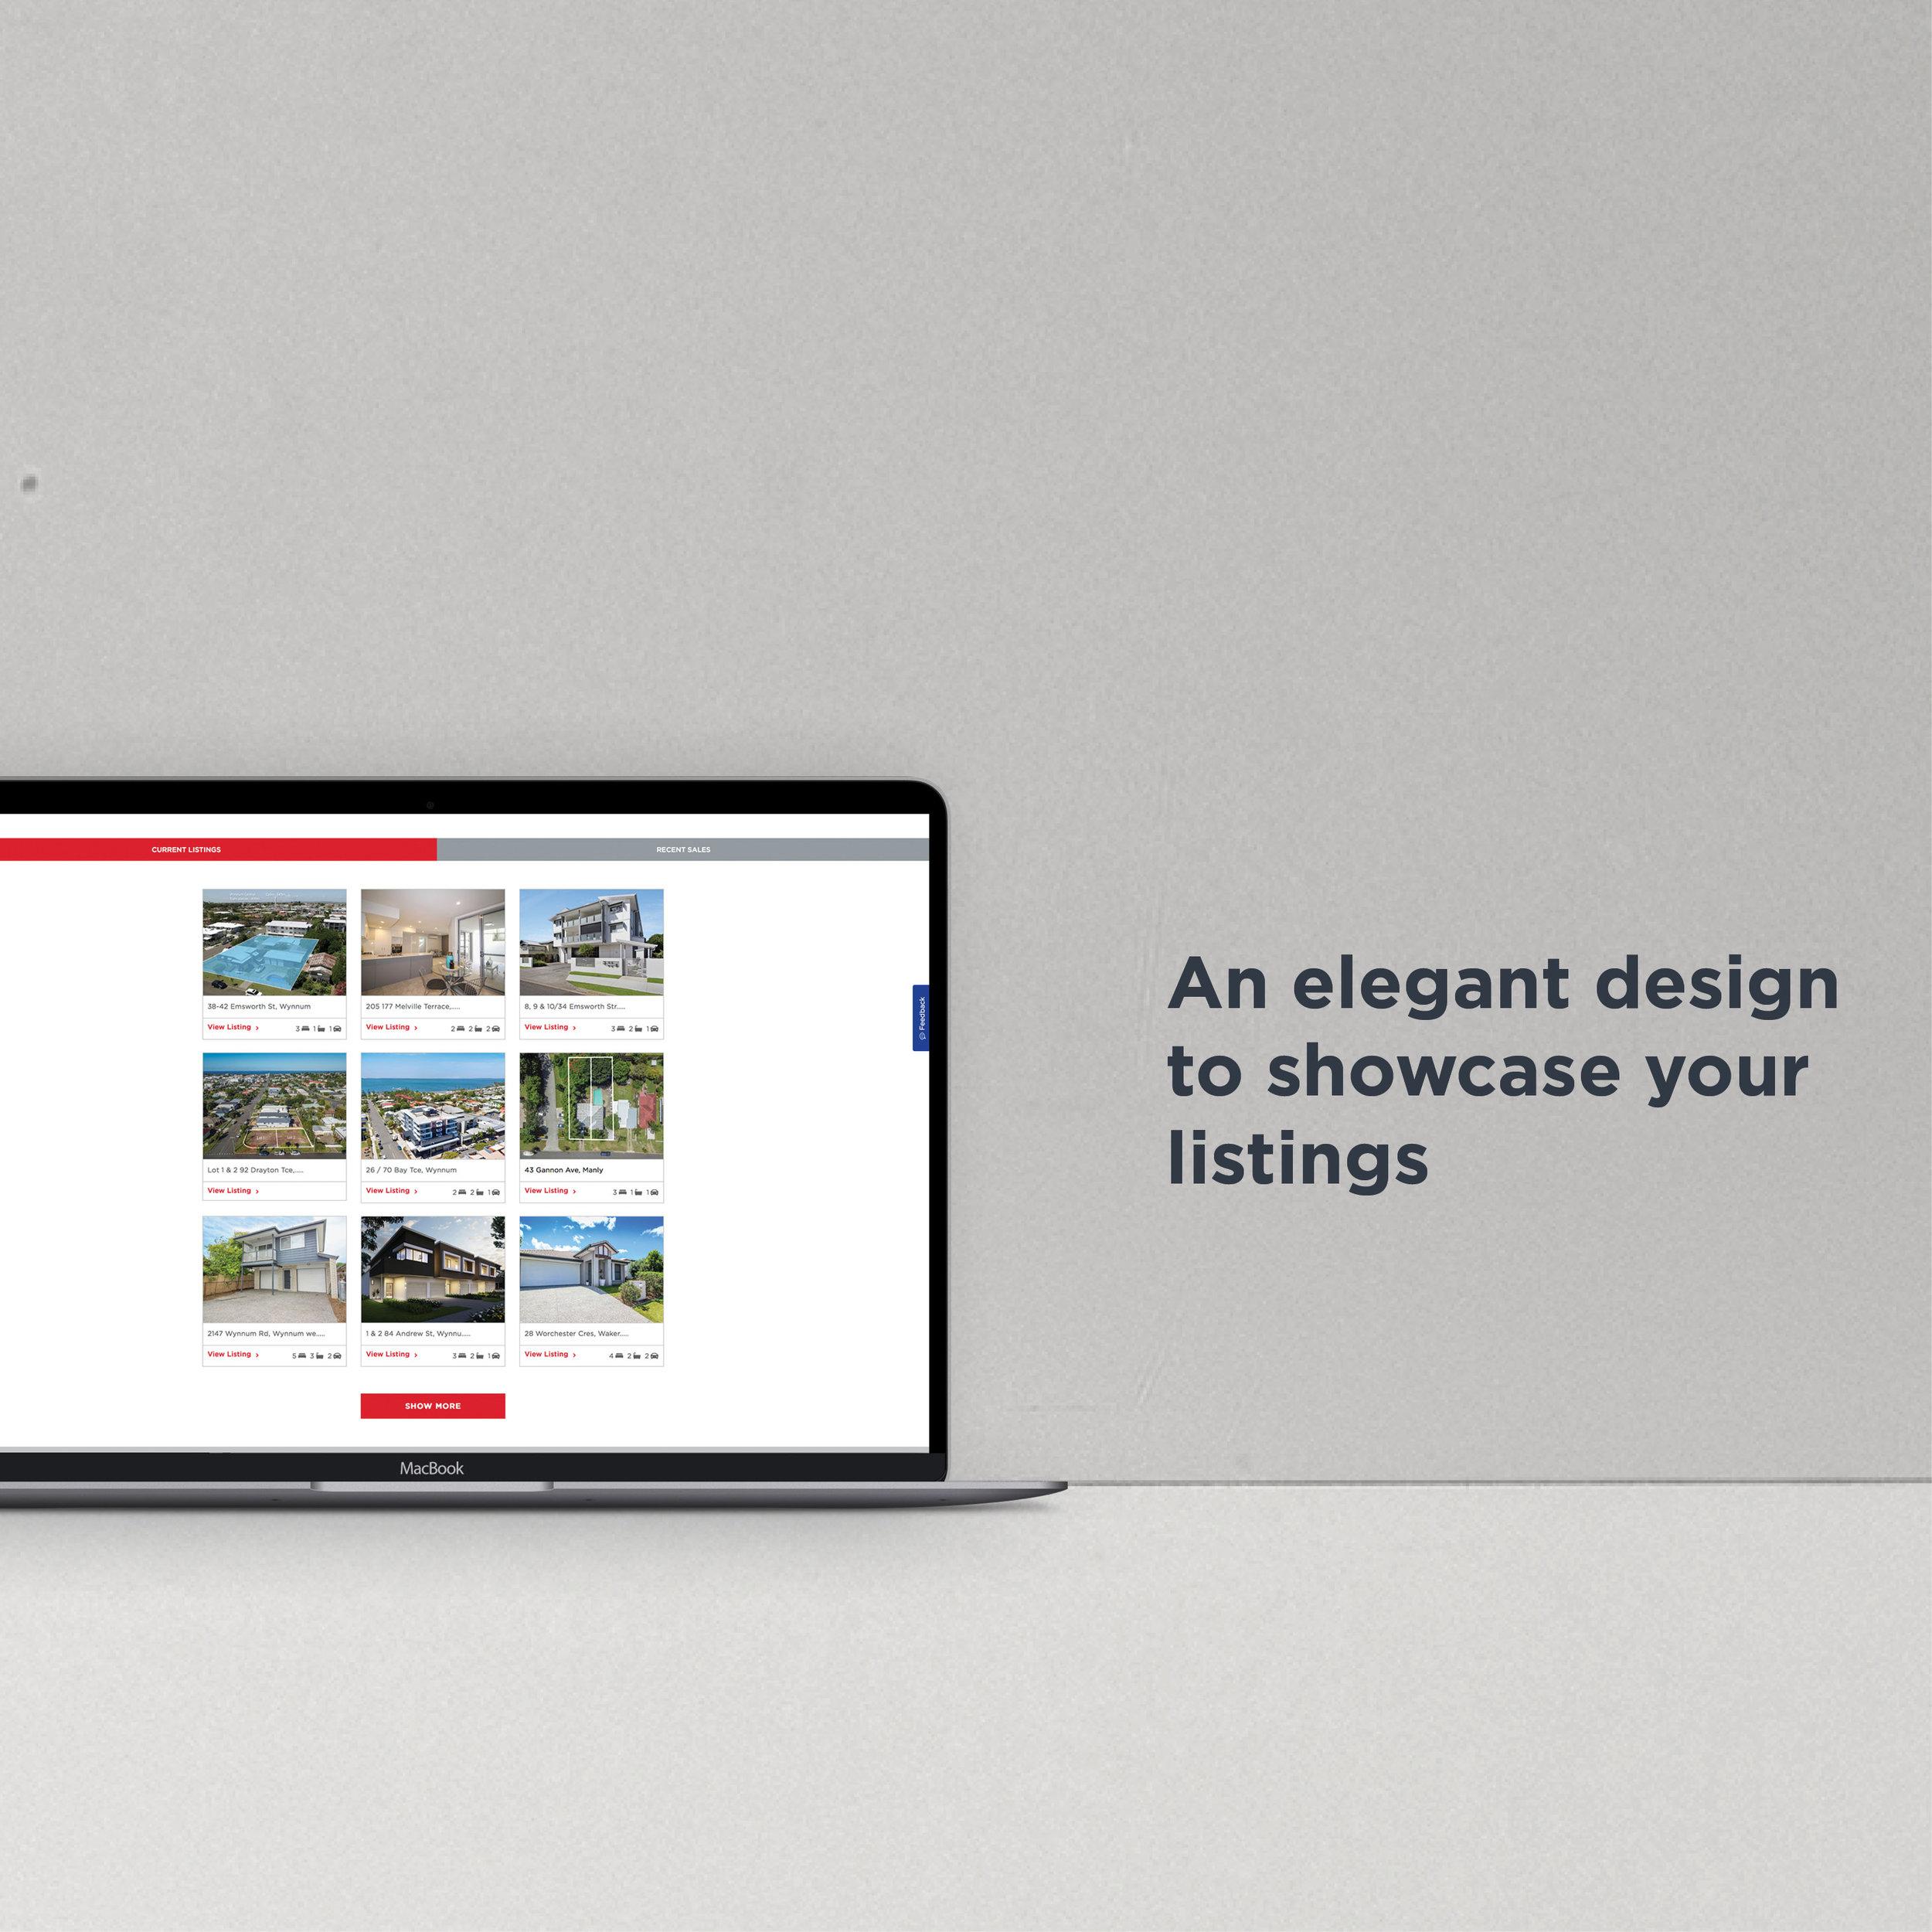 Website showcase-mockup7.jpg